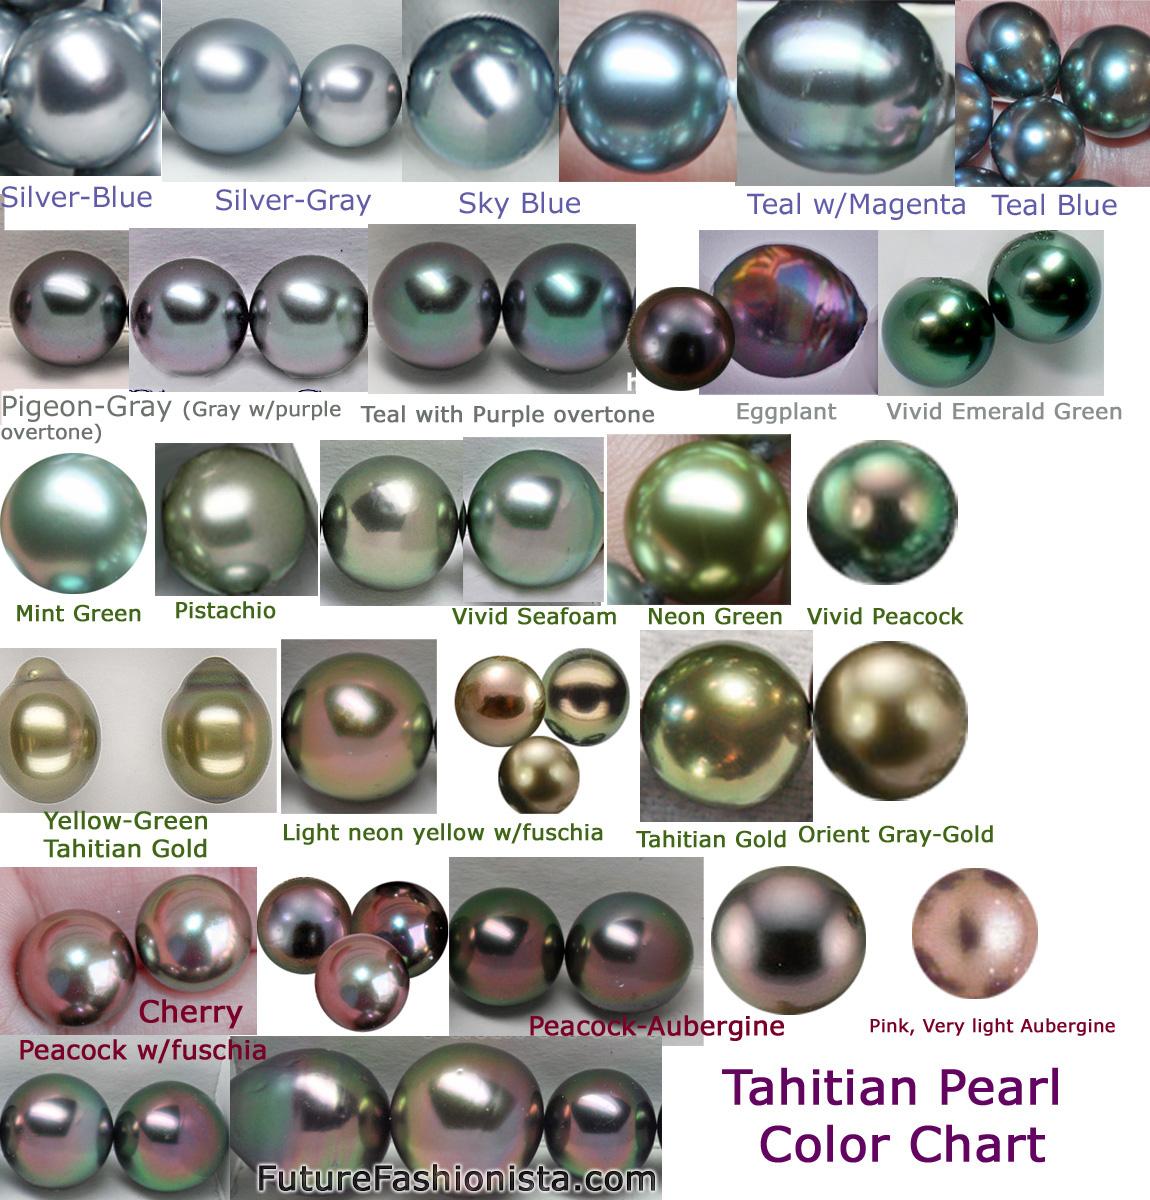 Eretz elana tahitian pearl color chart tahitiancolor chart nvjuhfo Images